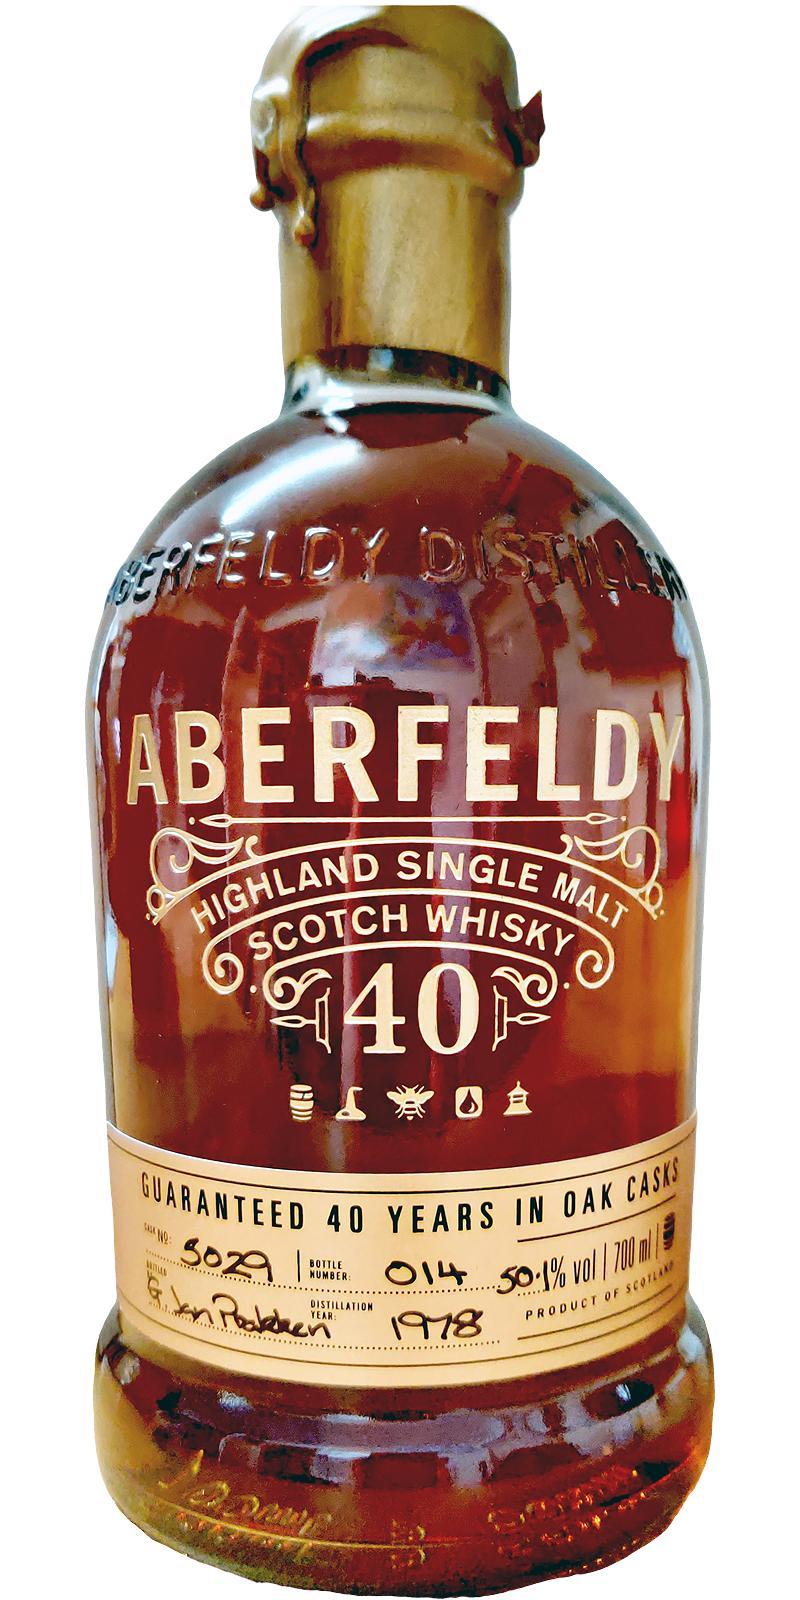 Aberfeldy 40-year-old